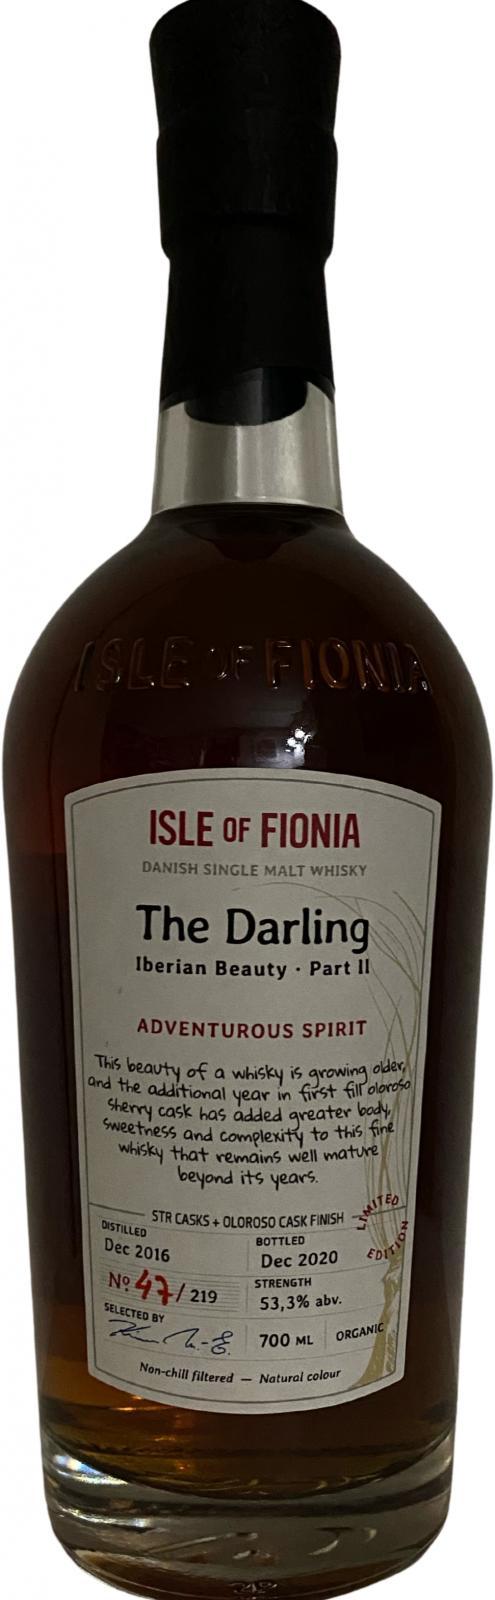 Isle of Fionia 2016 - The Darling